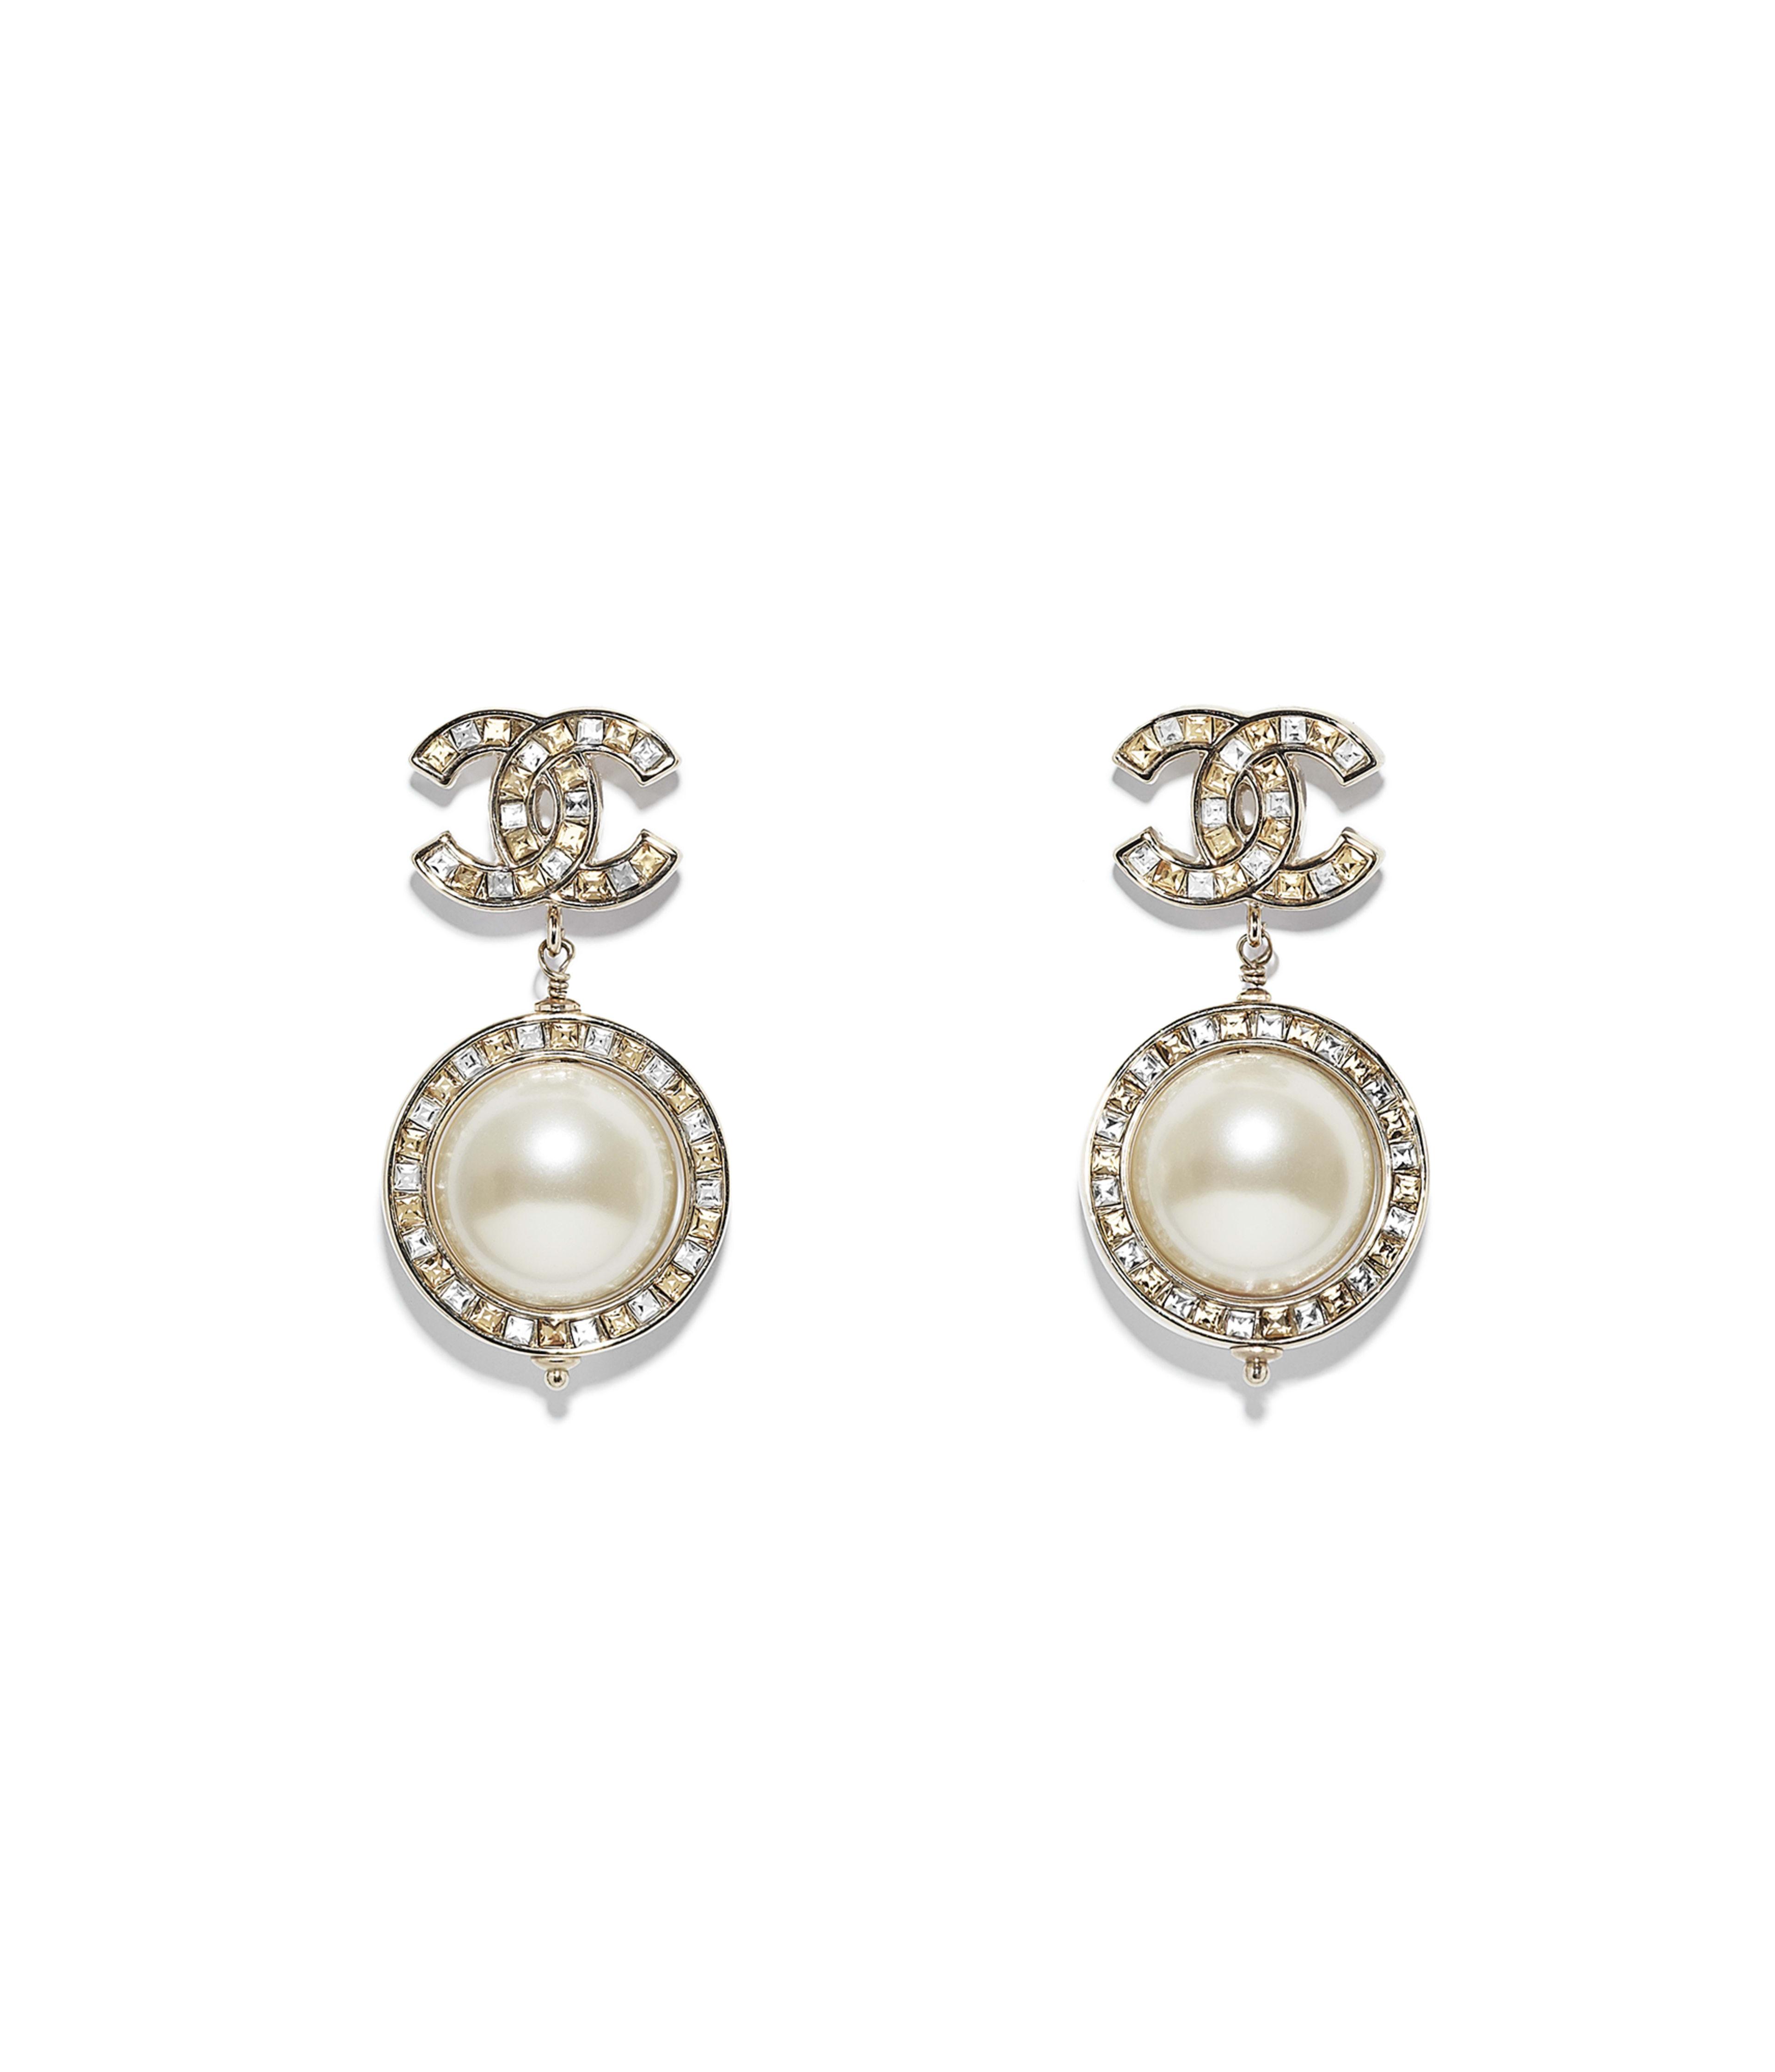 Earrings Metal Gl Pearls Str Gold Orange Crystal Pearly White Ref A53137y47287z5964